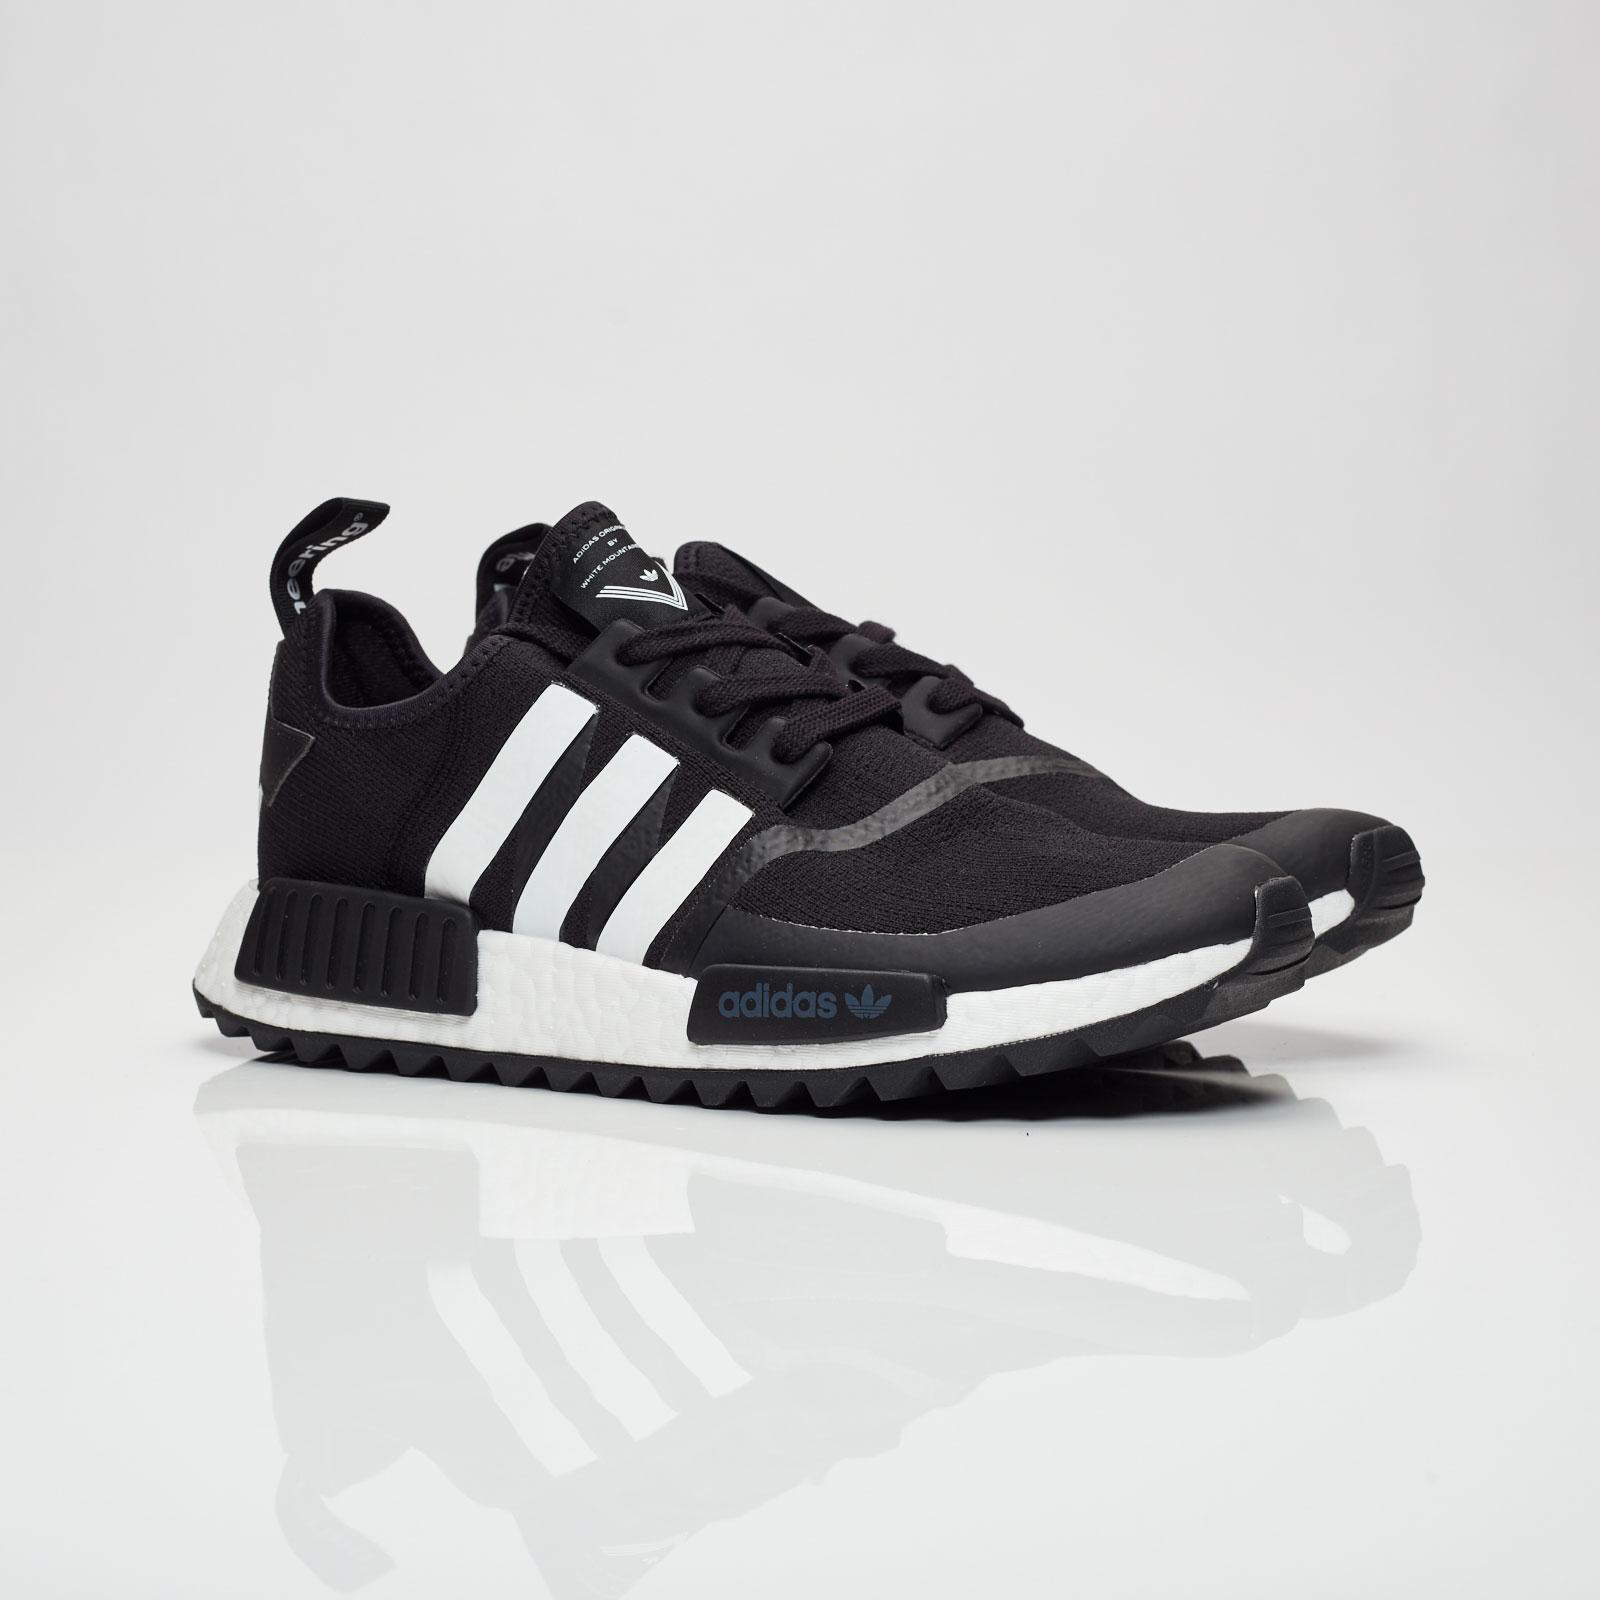 finest selection 72d53 7e7b9 adidas Wm Nmd Trail Pk - Ba7518 - Sneakersnstuff   sneakers ...